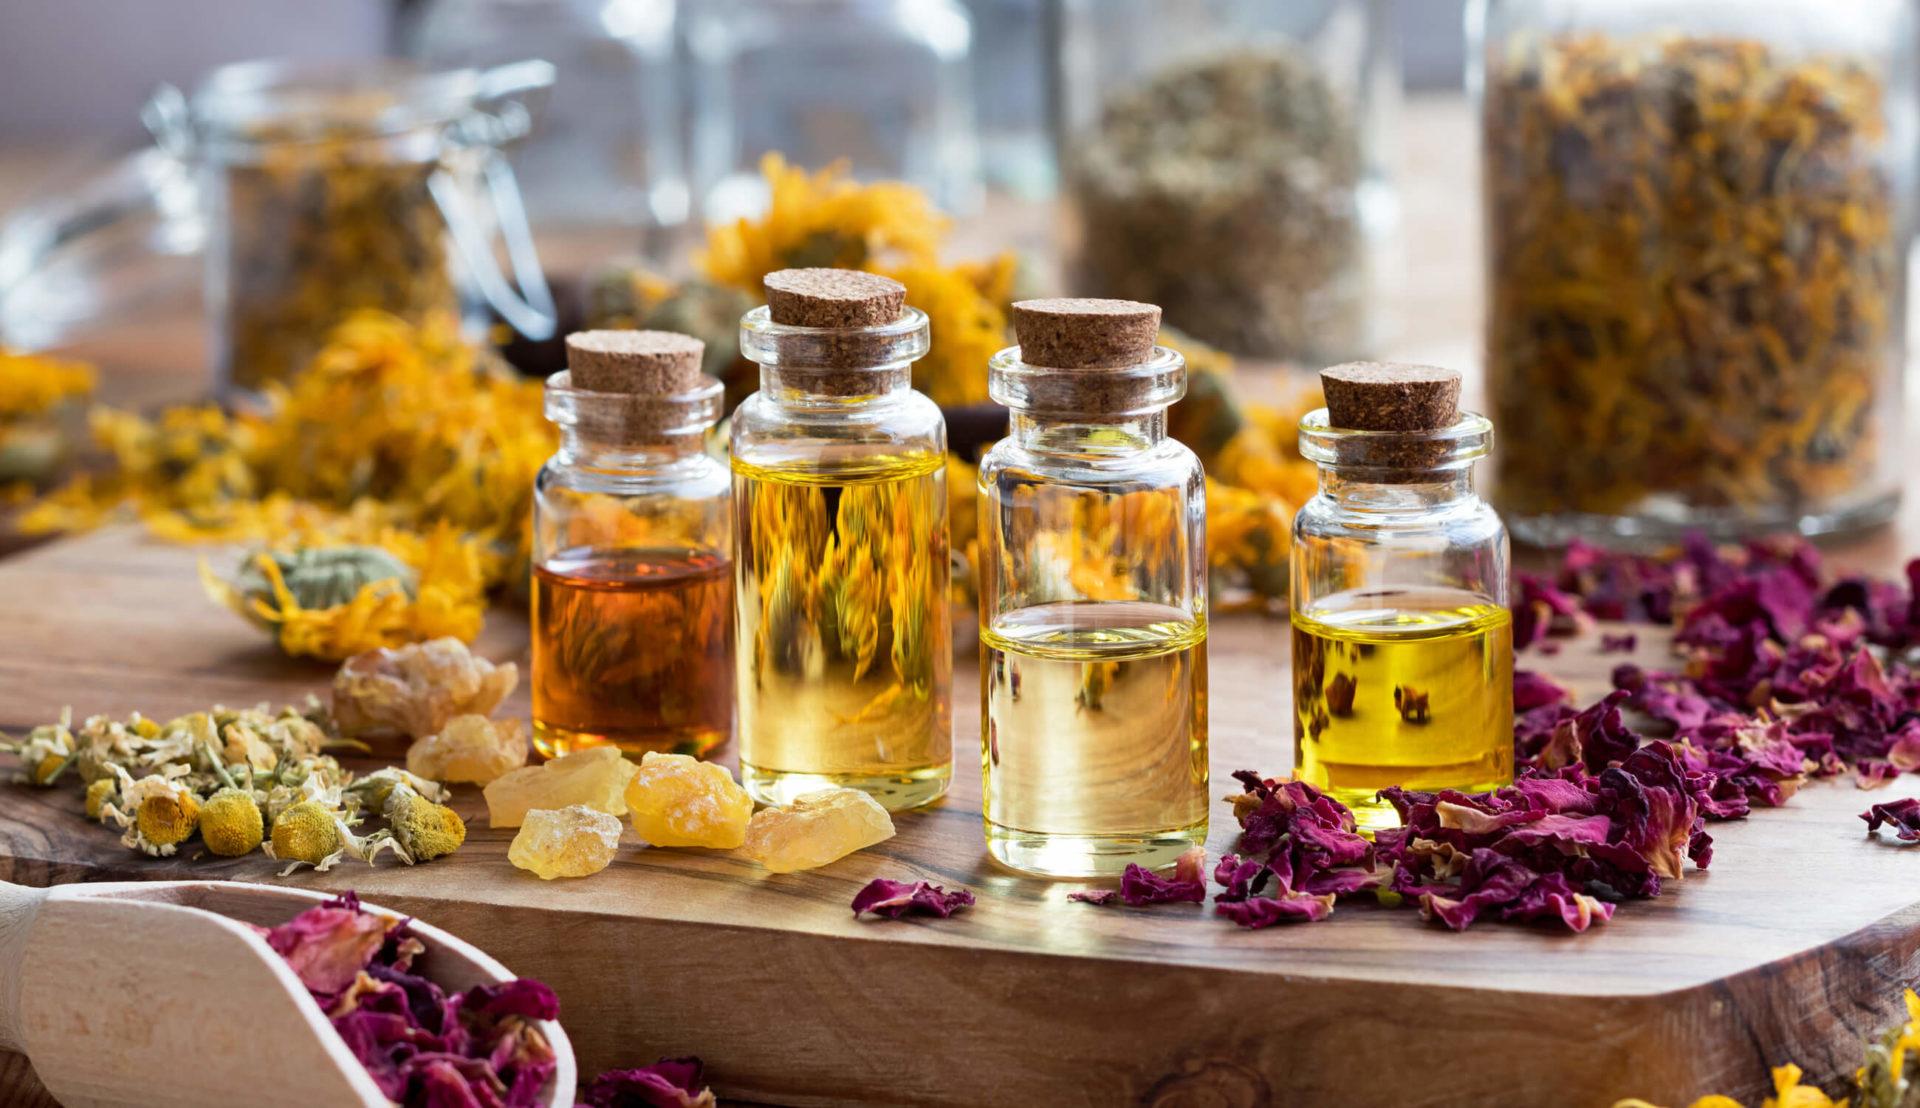 Bernadette Grampa - Aromaterapia